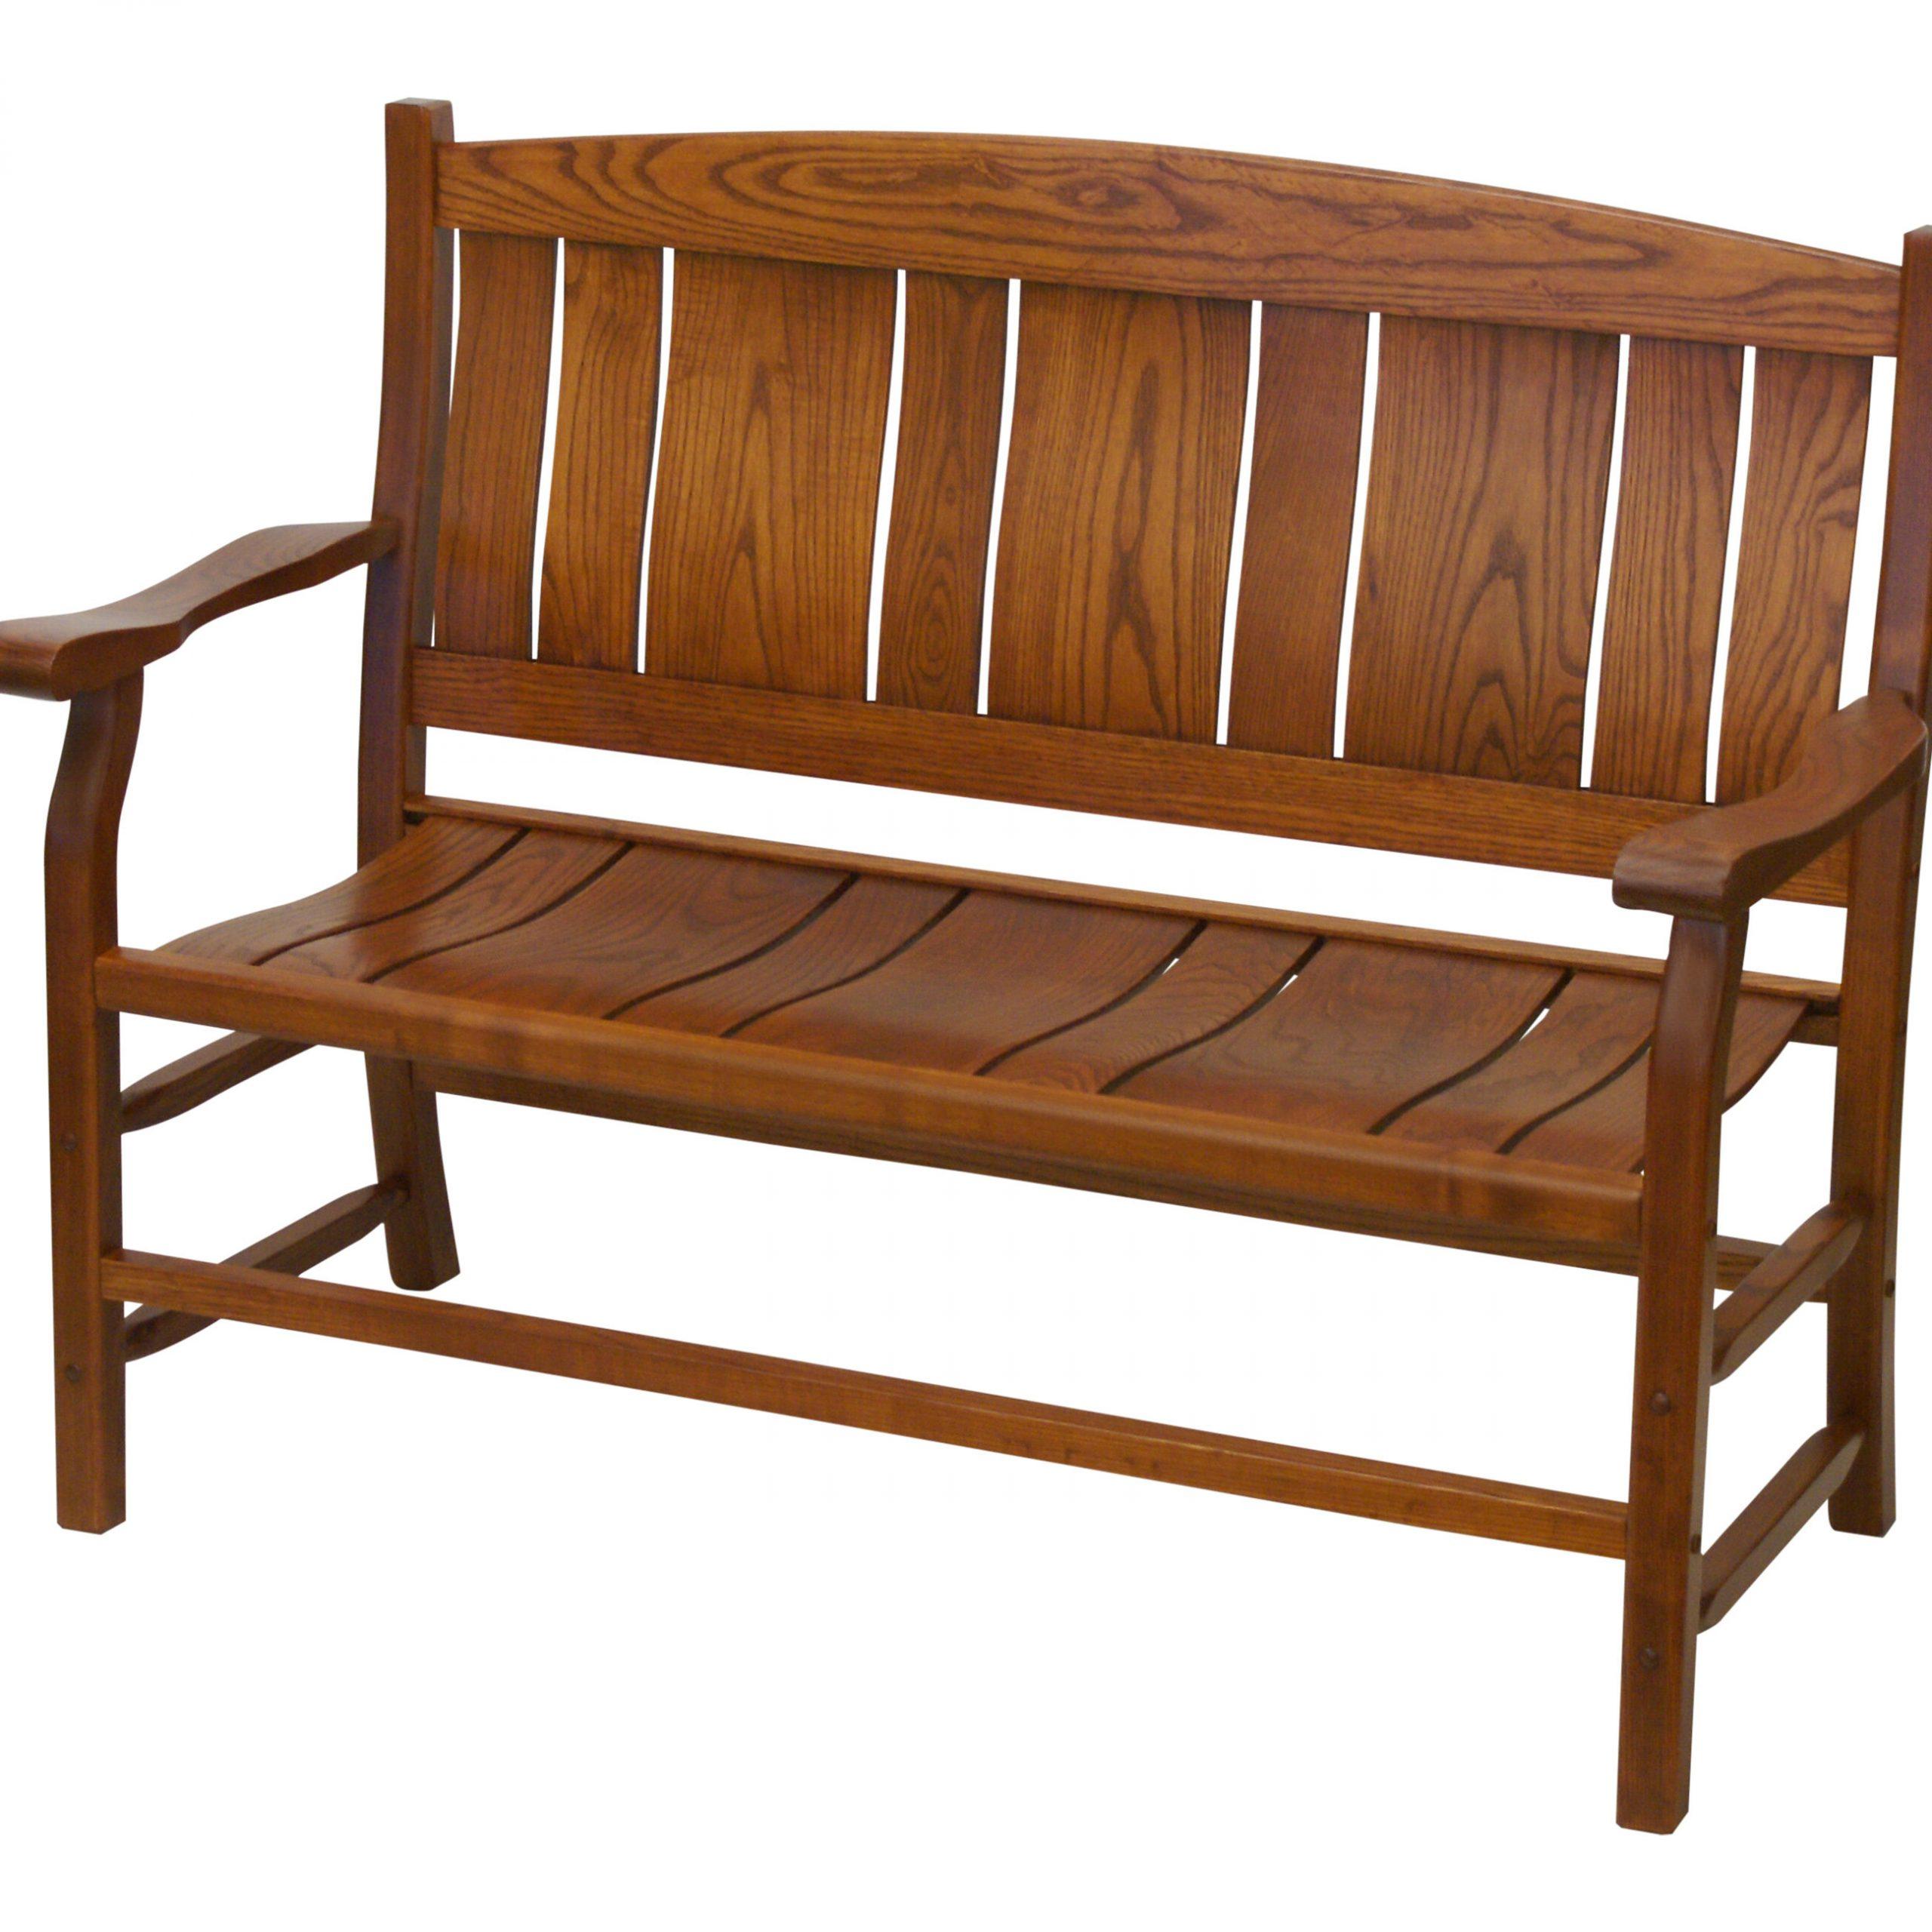 Leora Wooden Garden Benches In Most Popular Grindle Slat Back Wooden Garden Bench (View 20 of 30)